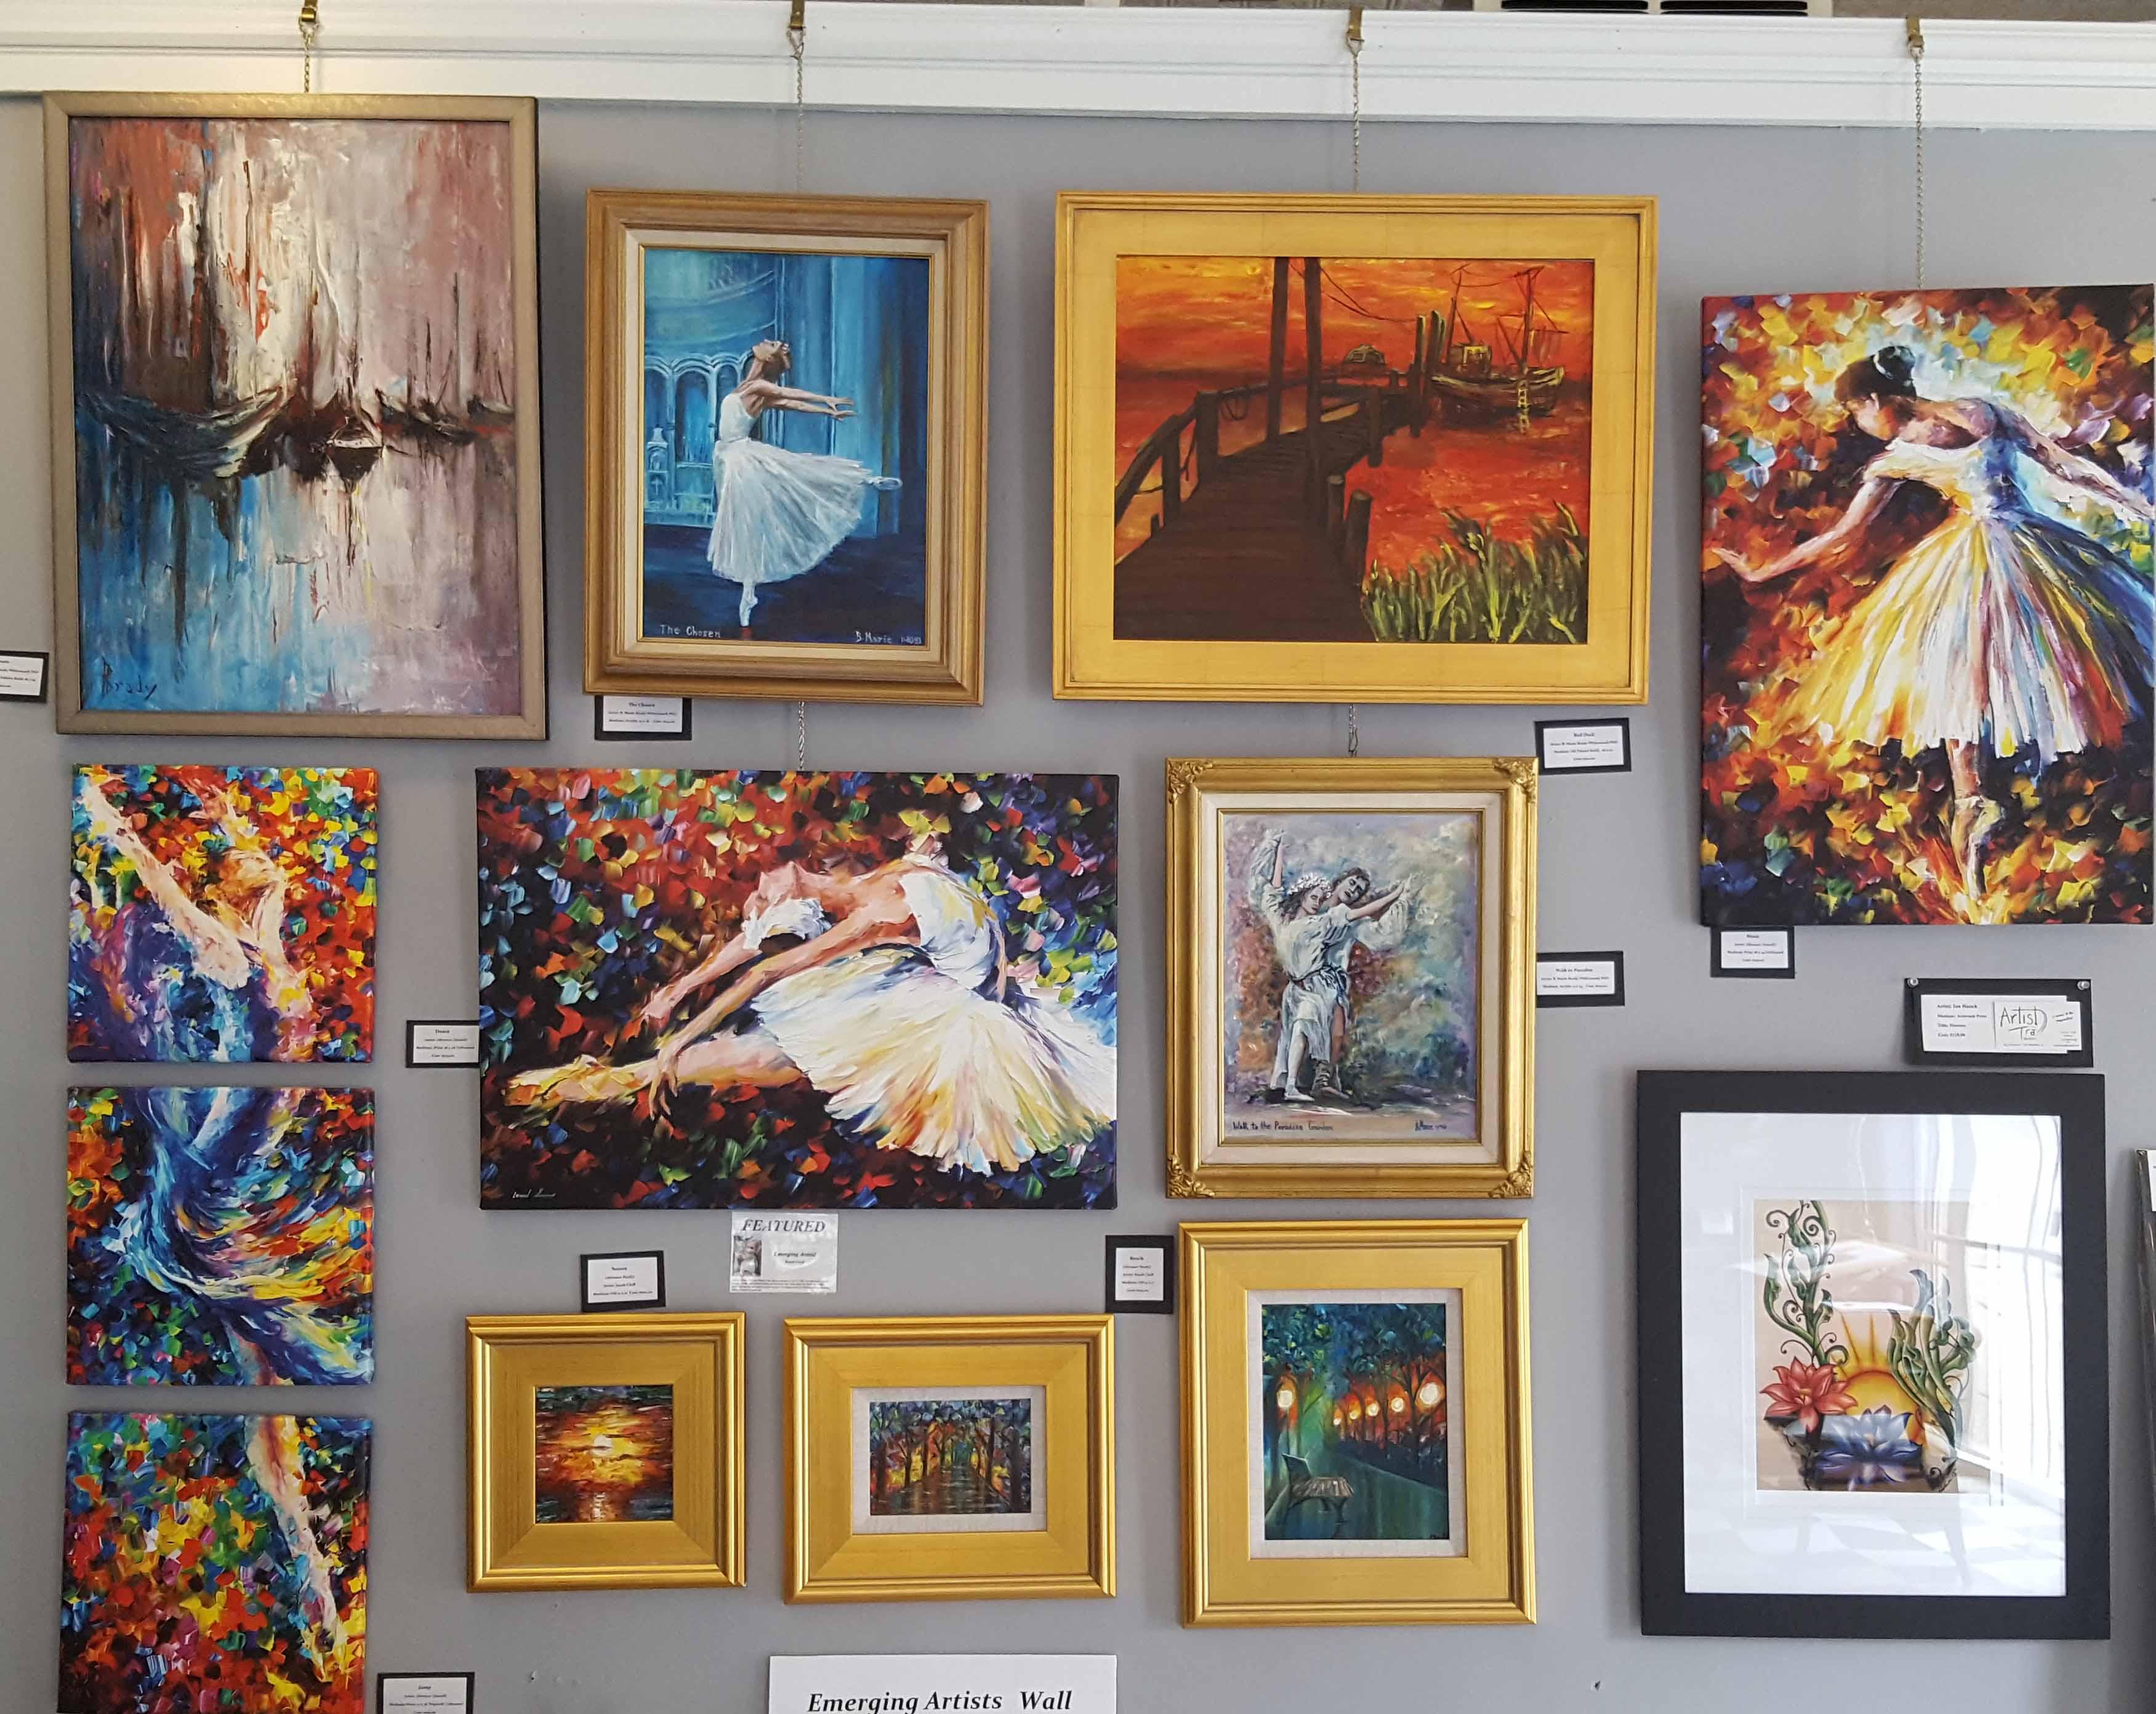 Emerging Artists Wall